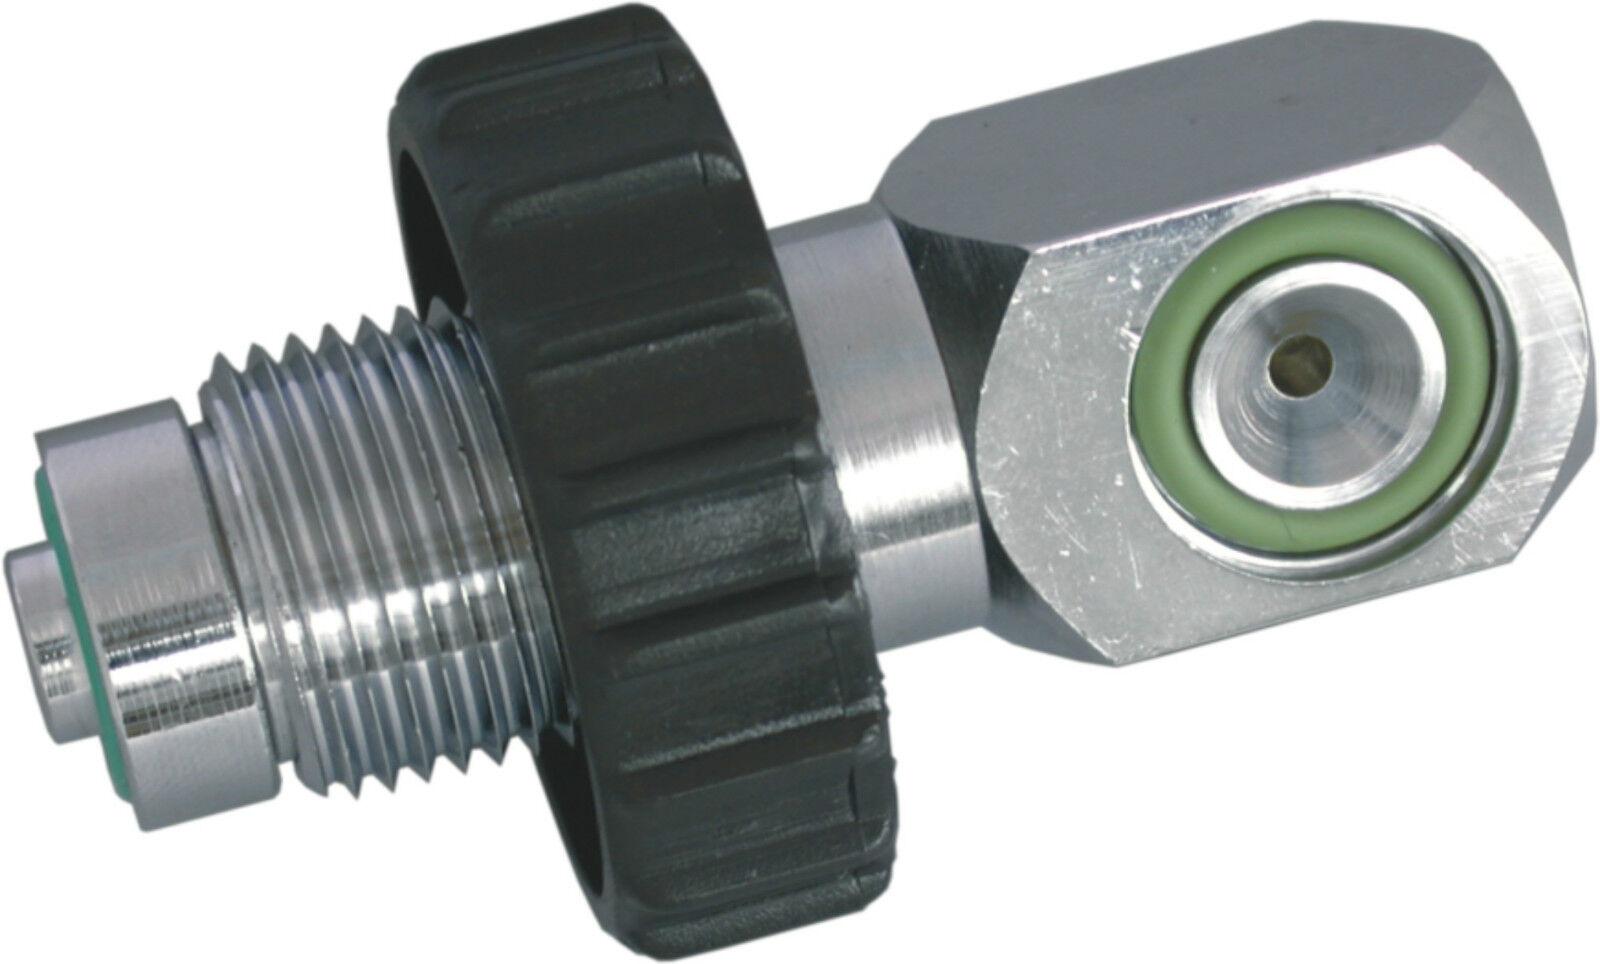 OTTER 232 BAR A-clamp 300 BAR DIN Male Charging adaptor. - AD A3DM